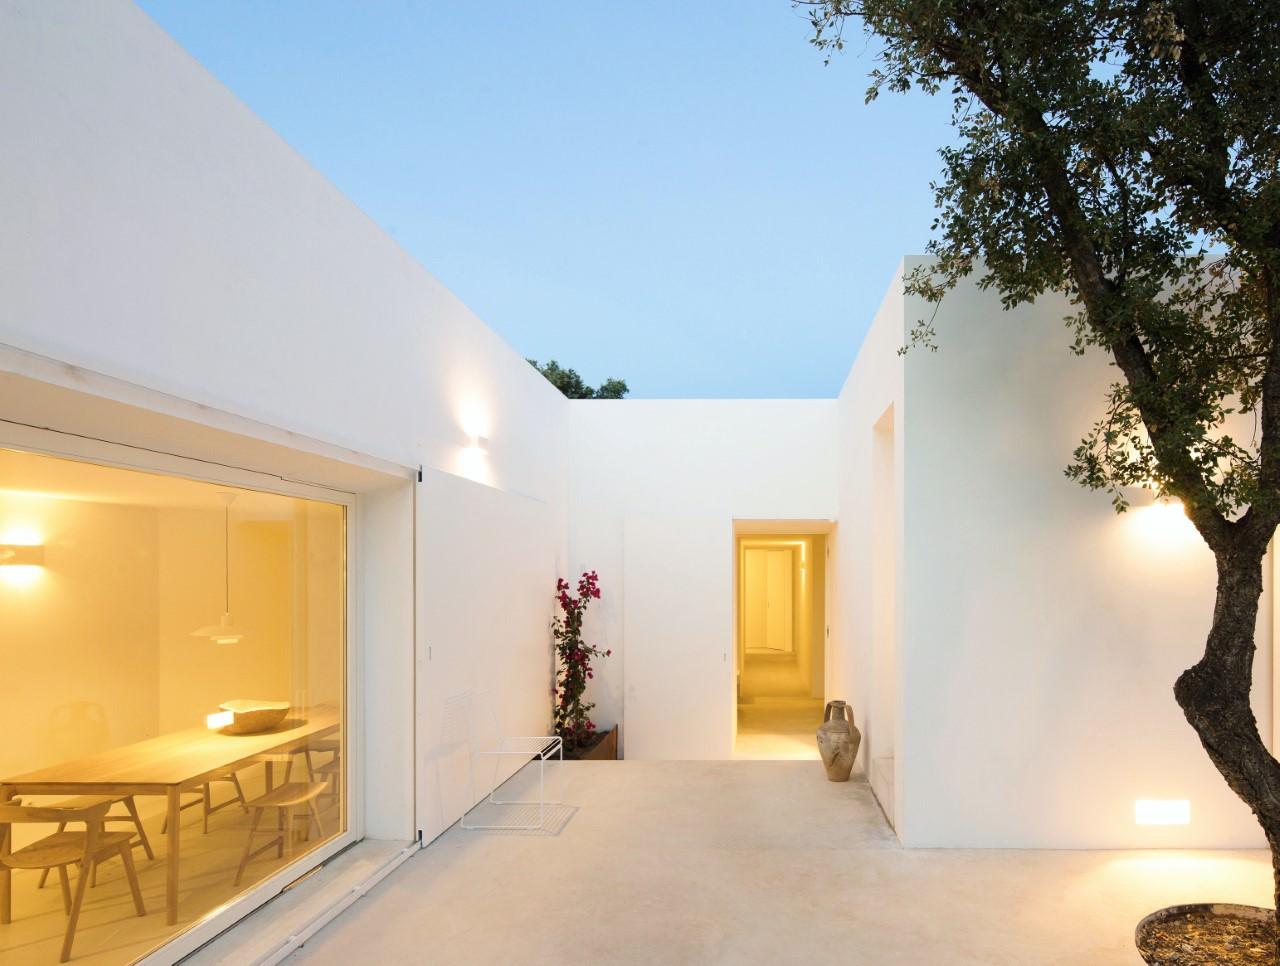 Zalig-Algarve-Casa-Luum-246-1_1